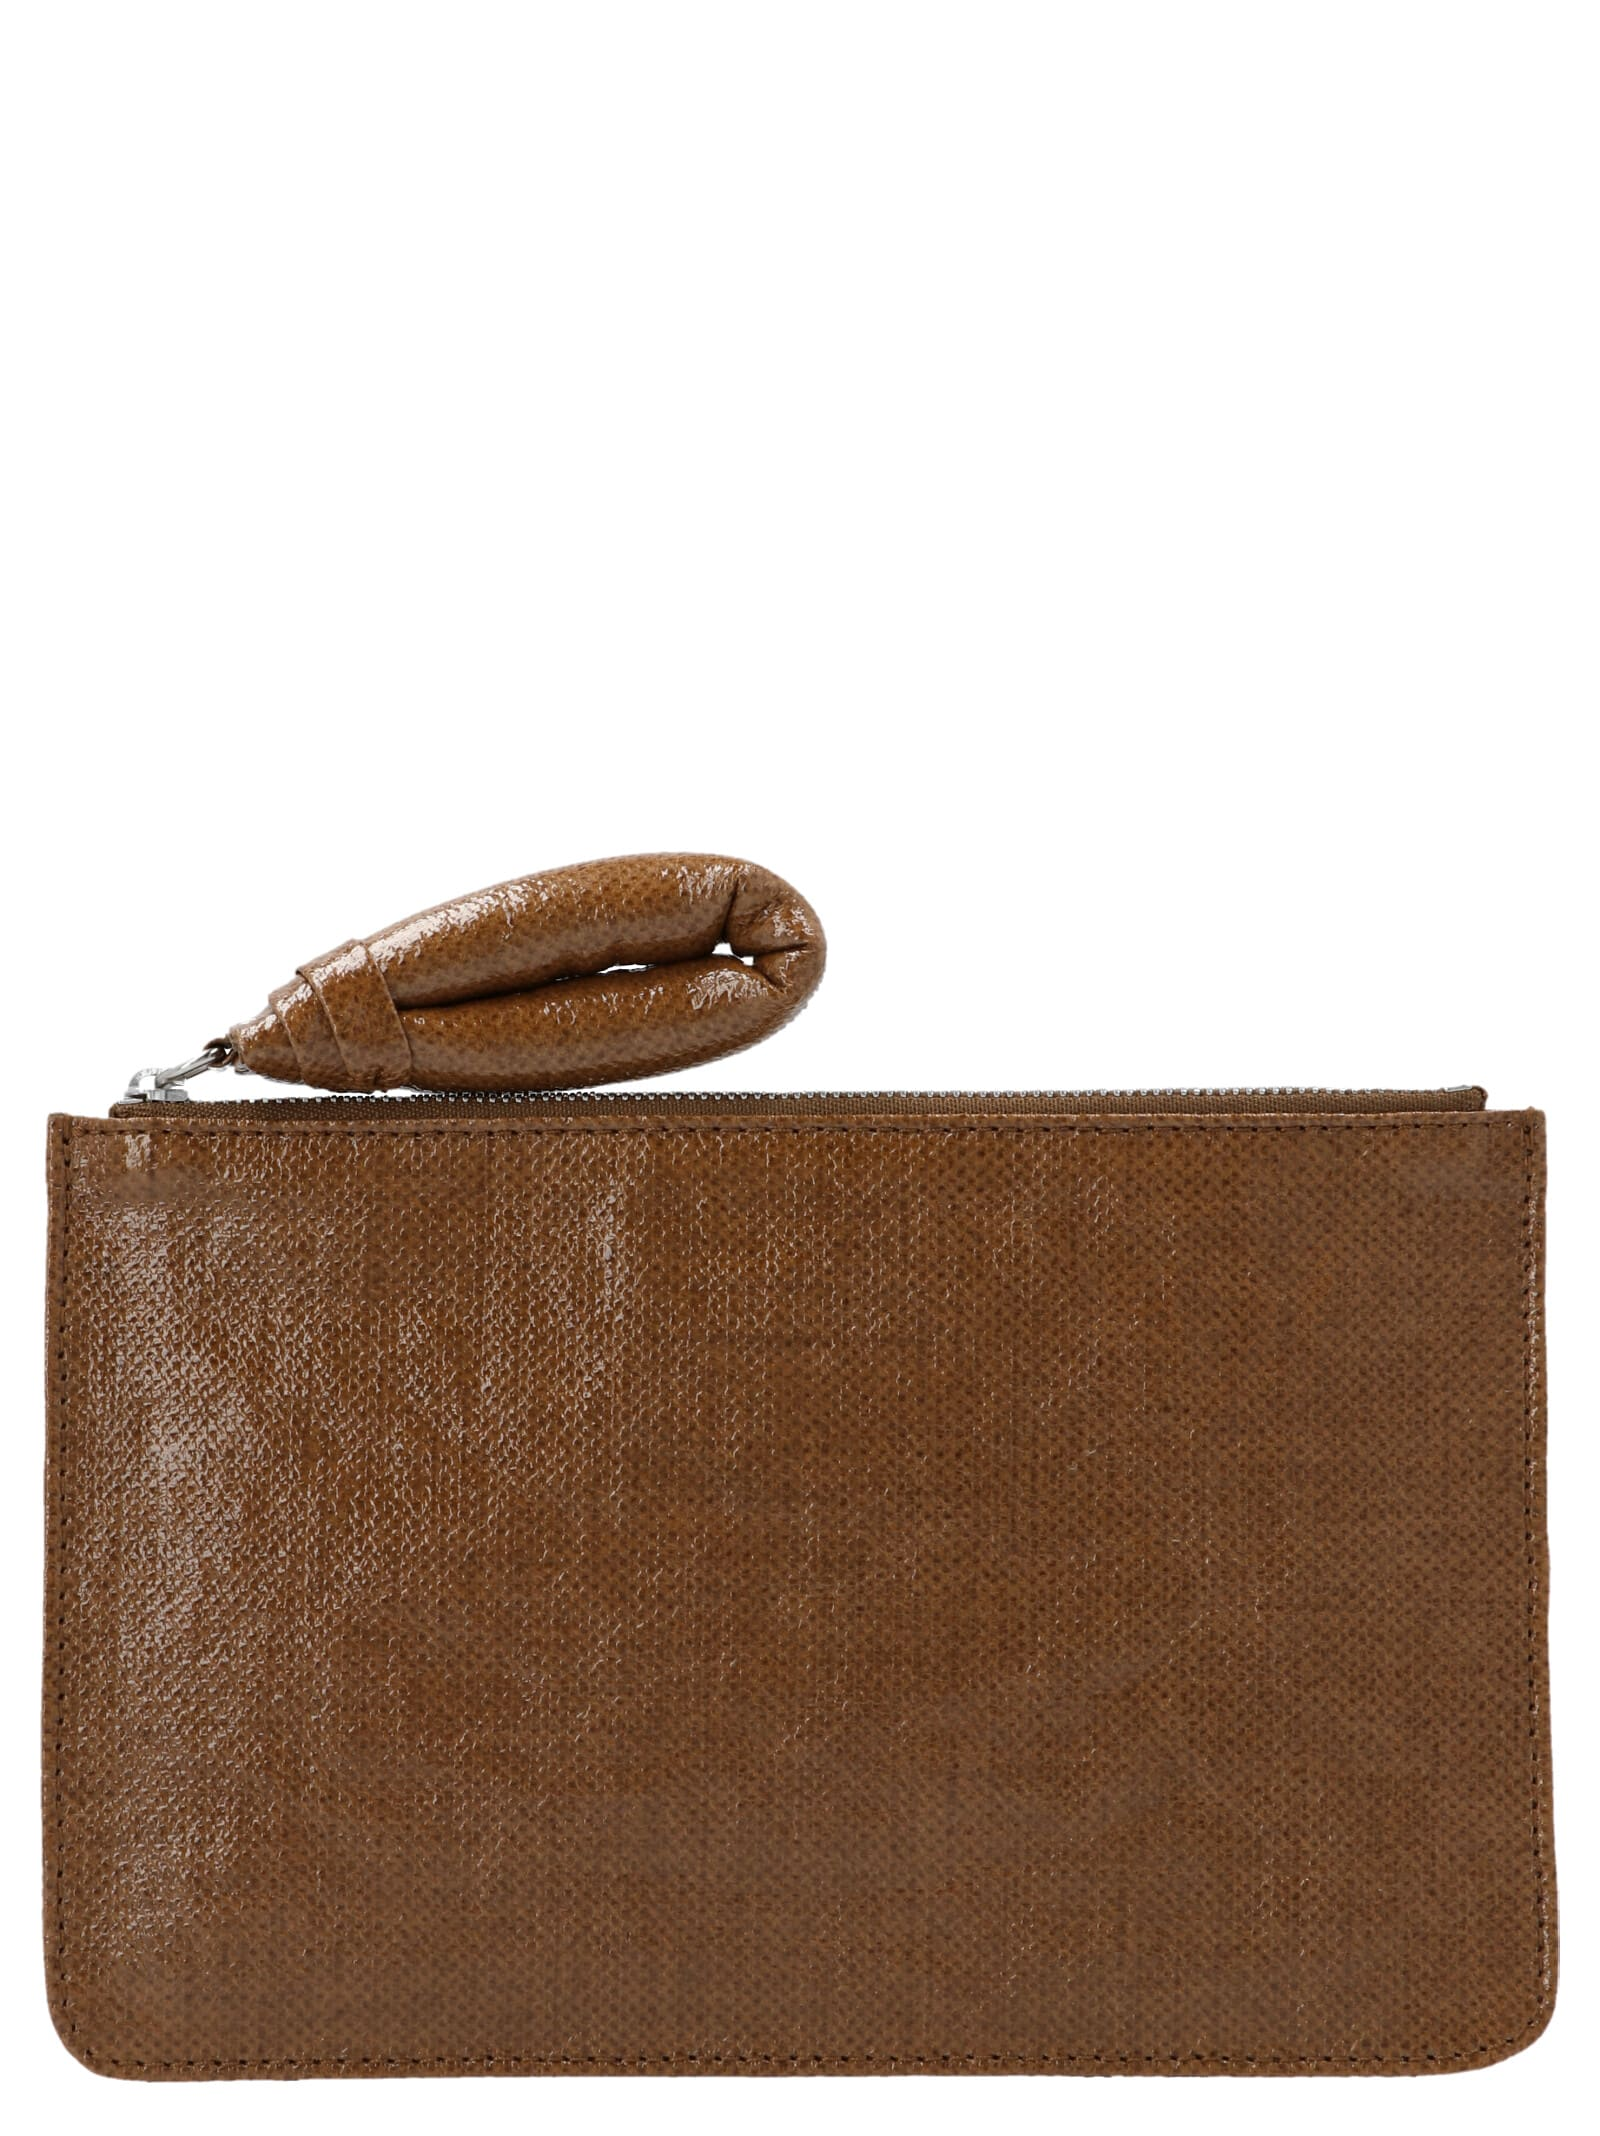 Lemaire A5 FOLDER BAG